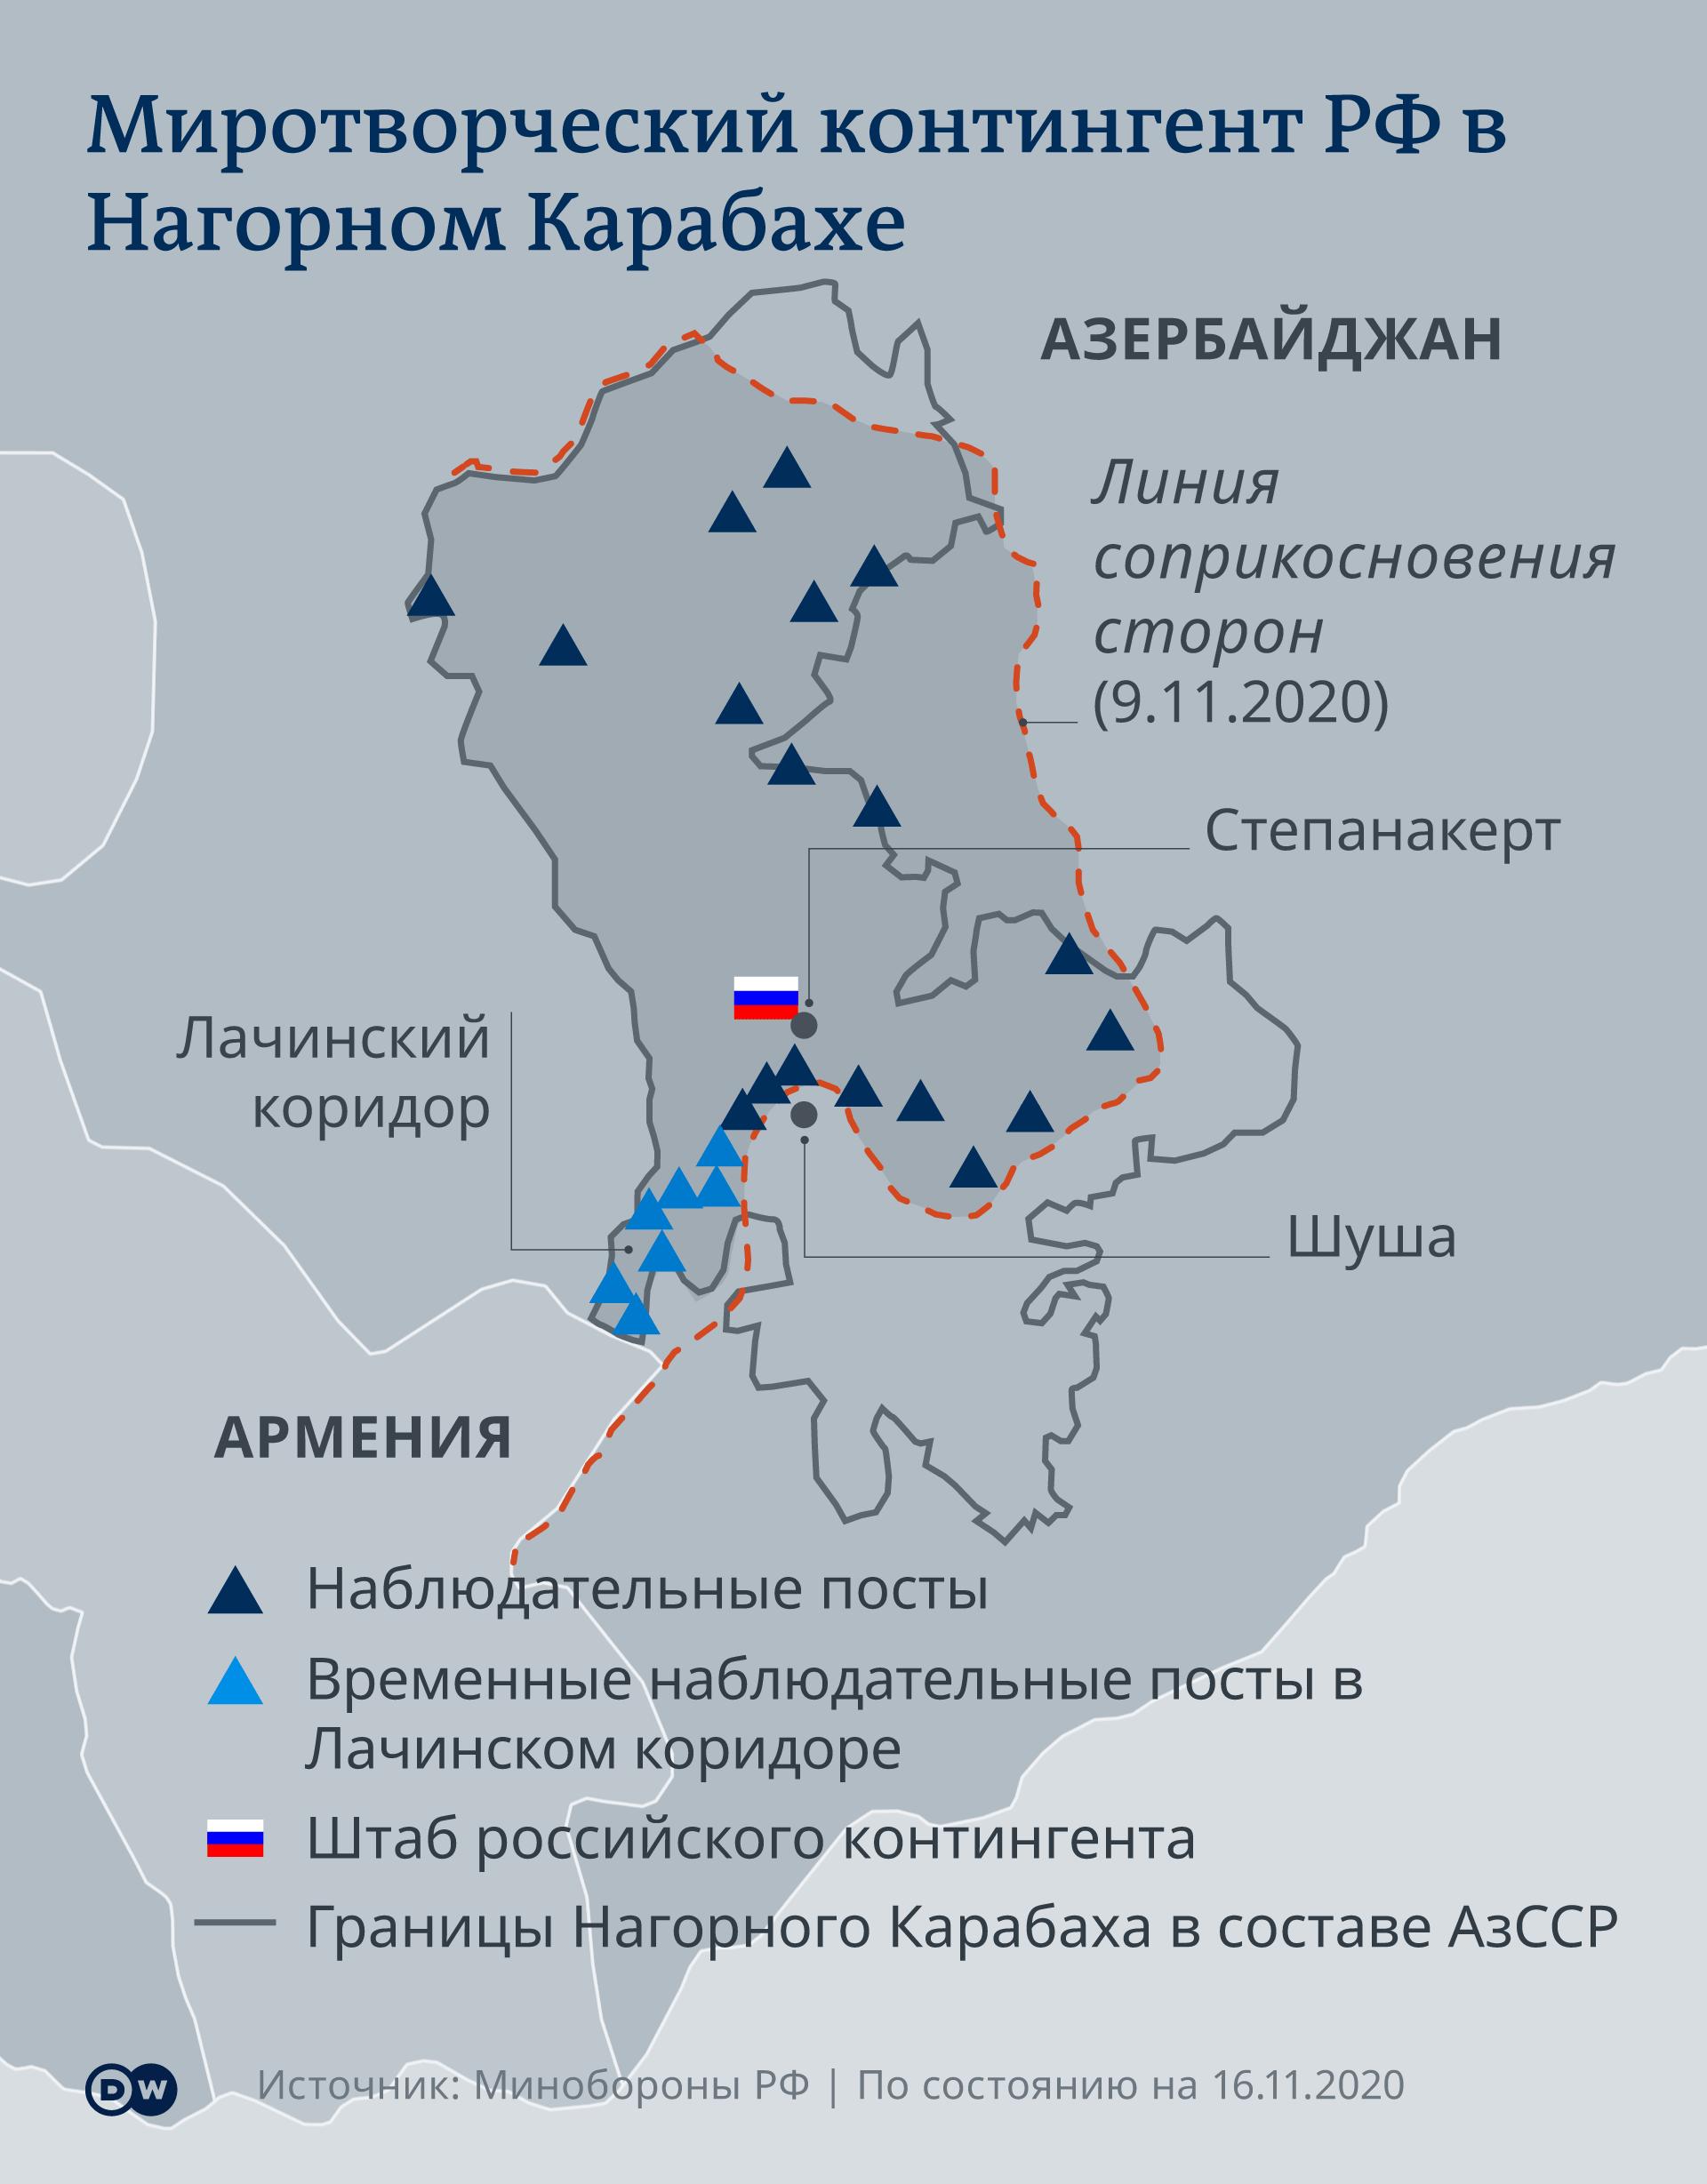 Infografik russische Friedenstruppen in Berg-Karabach RU